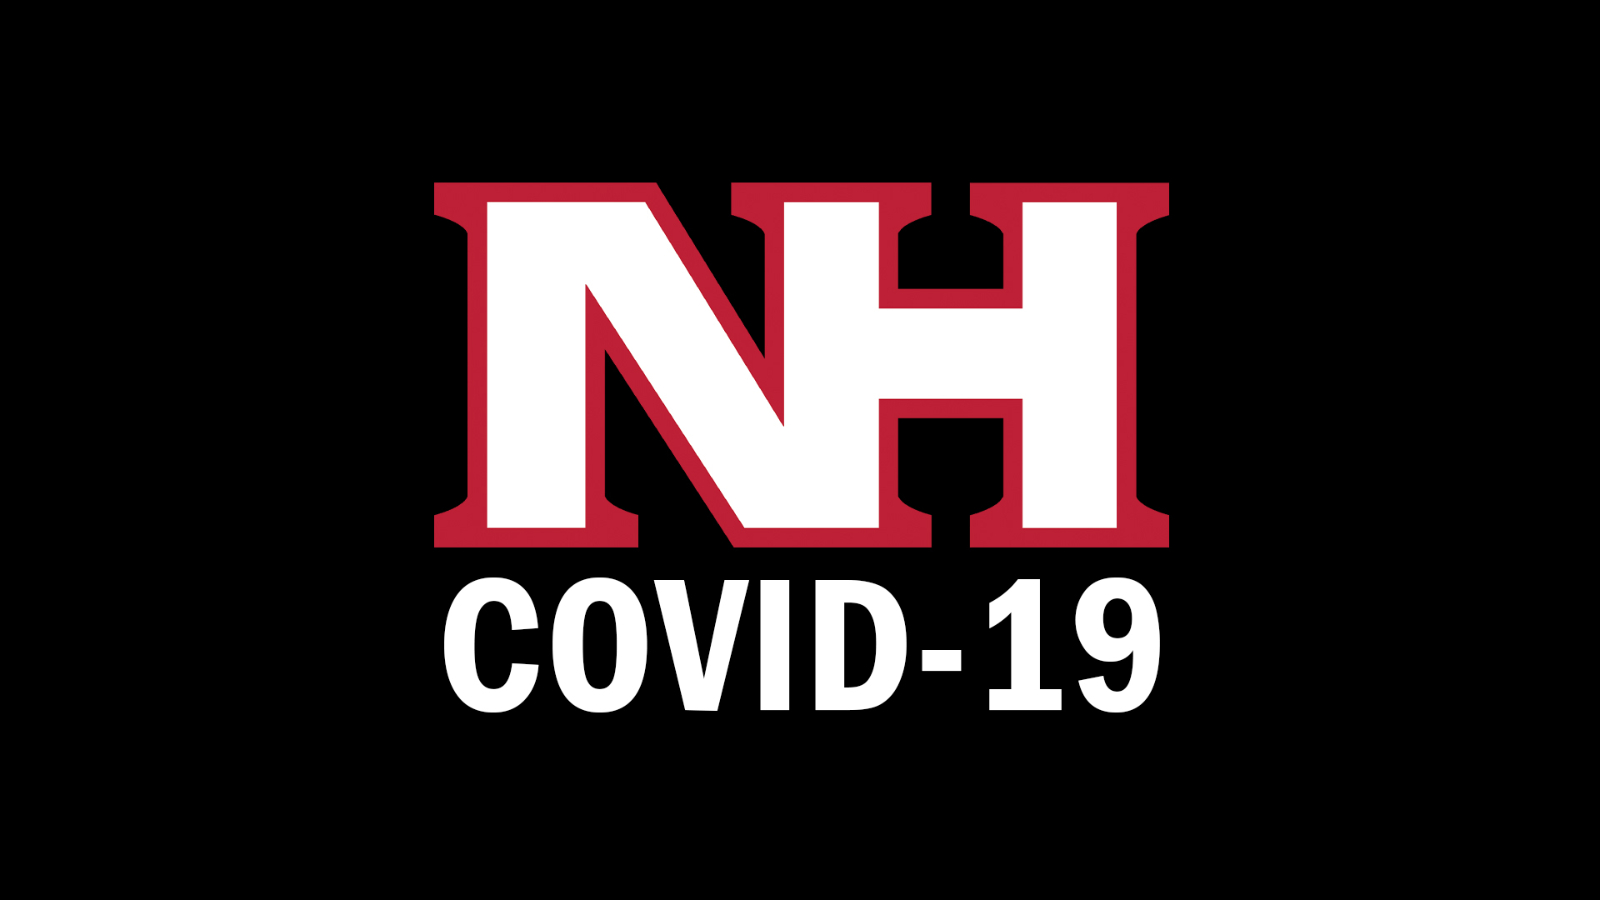 North Hills basketball coach positive for COVID-19, Boys programs shut down until Jan. 20